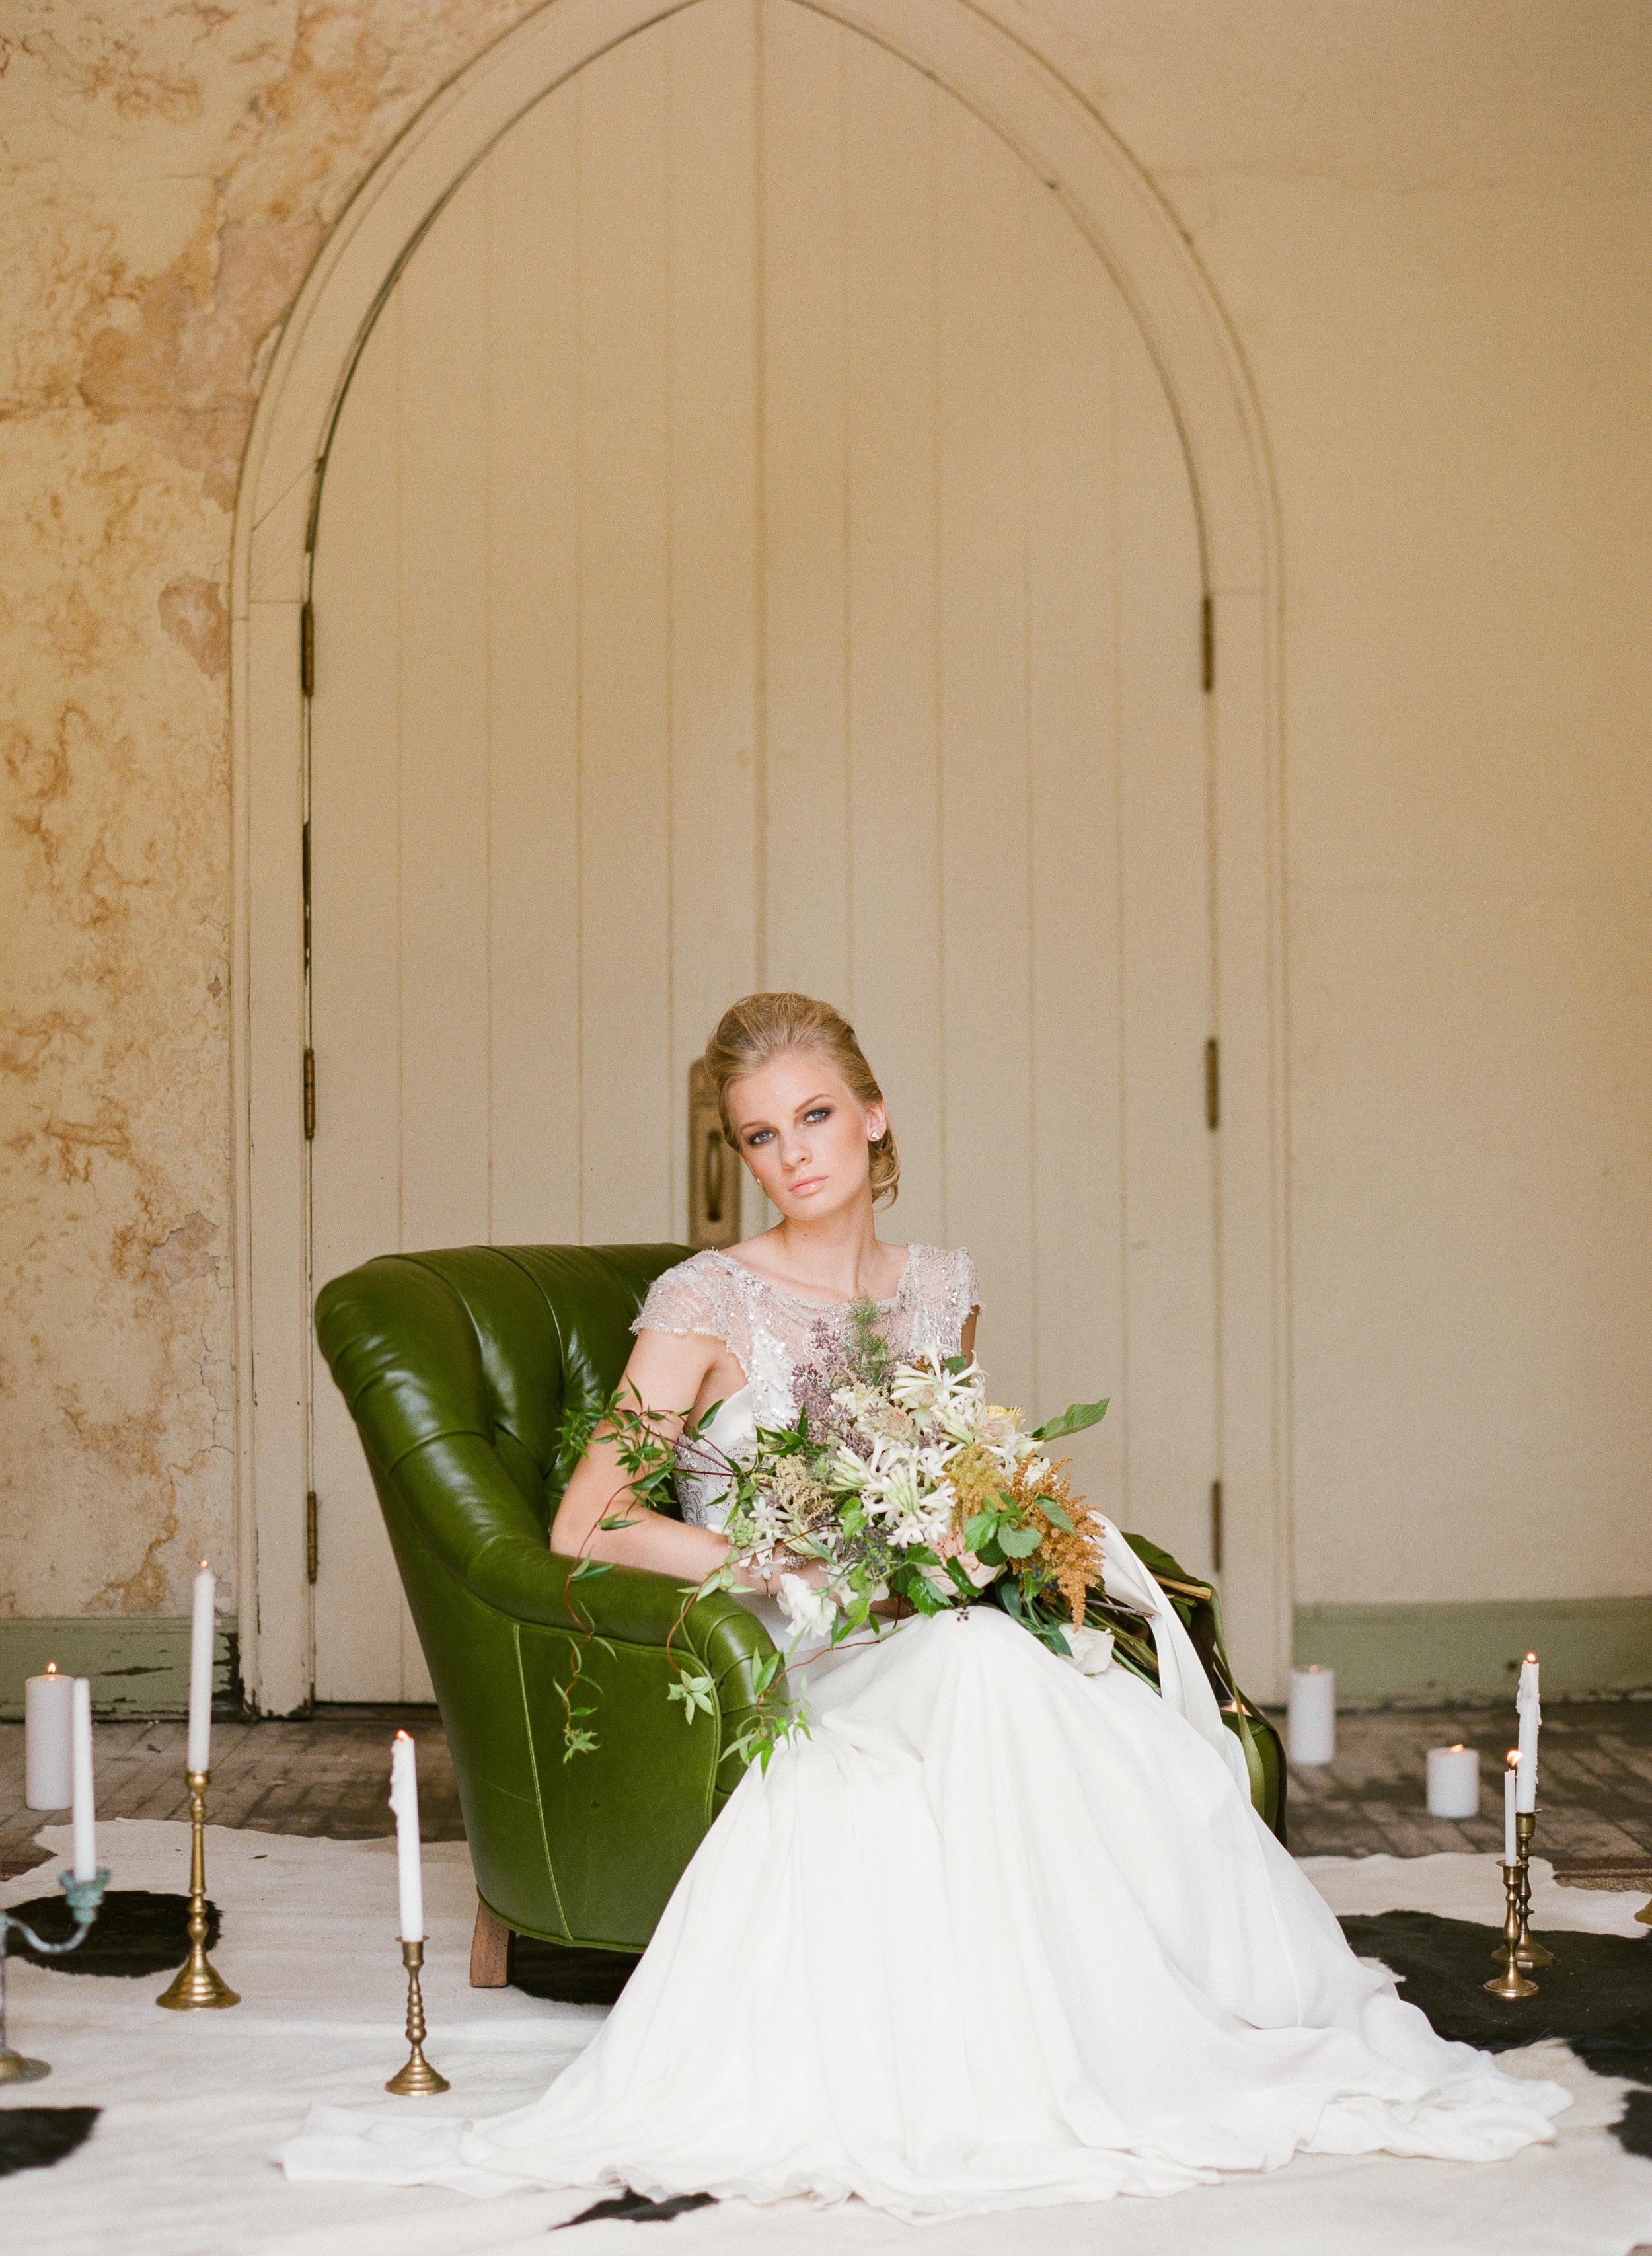 Olivia-Griffin-trendy-bride-magazine-willow-florals-sarah-seven-gwen-ivory-and-beau-bridal-boutique-savannah-wedding-dresses-savannah-bridal-boutique-savannah-wedding-savannah-bridal-gowns-savannah-wedding-planner-georgia-bridal-boutique-2.JPG